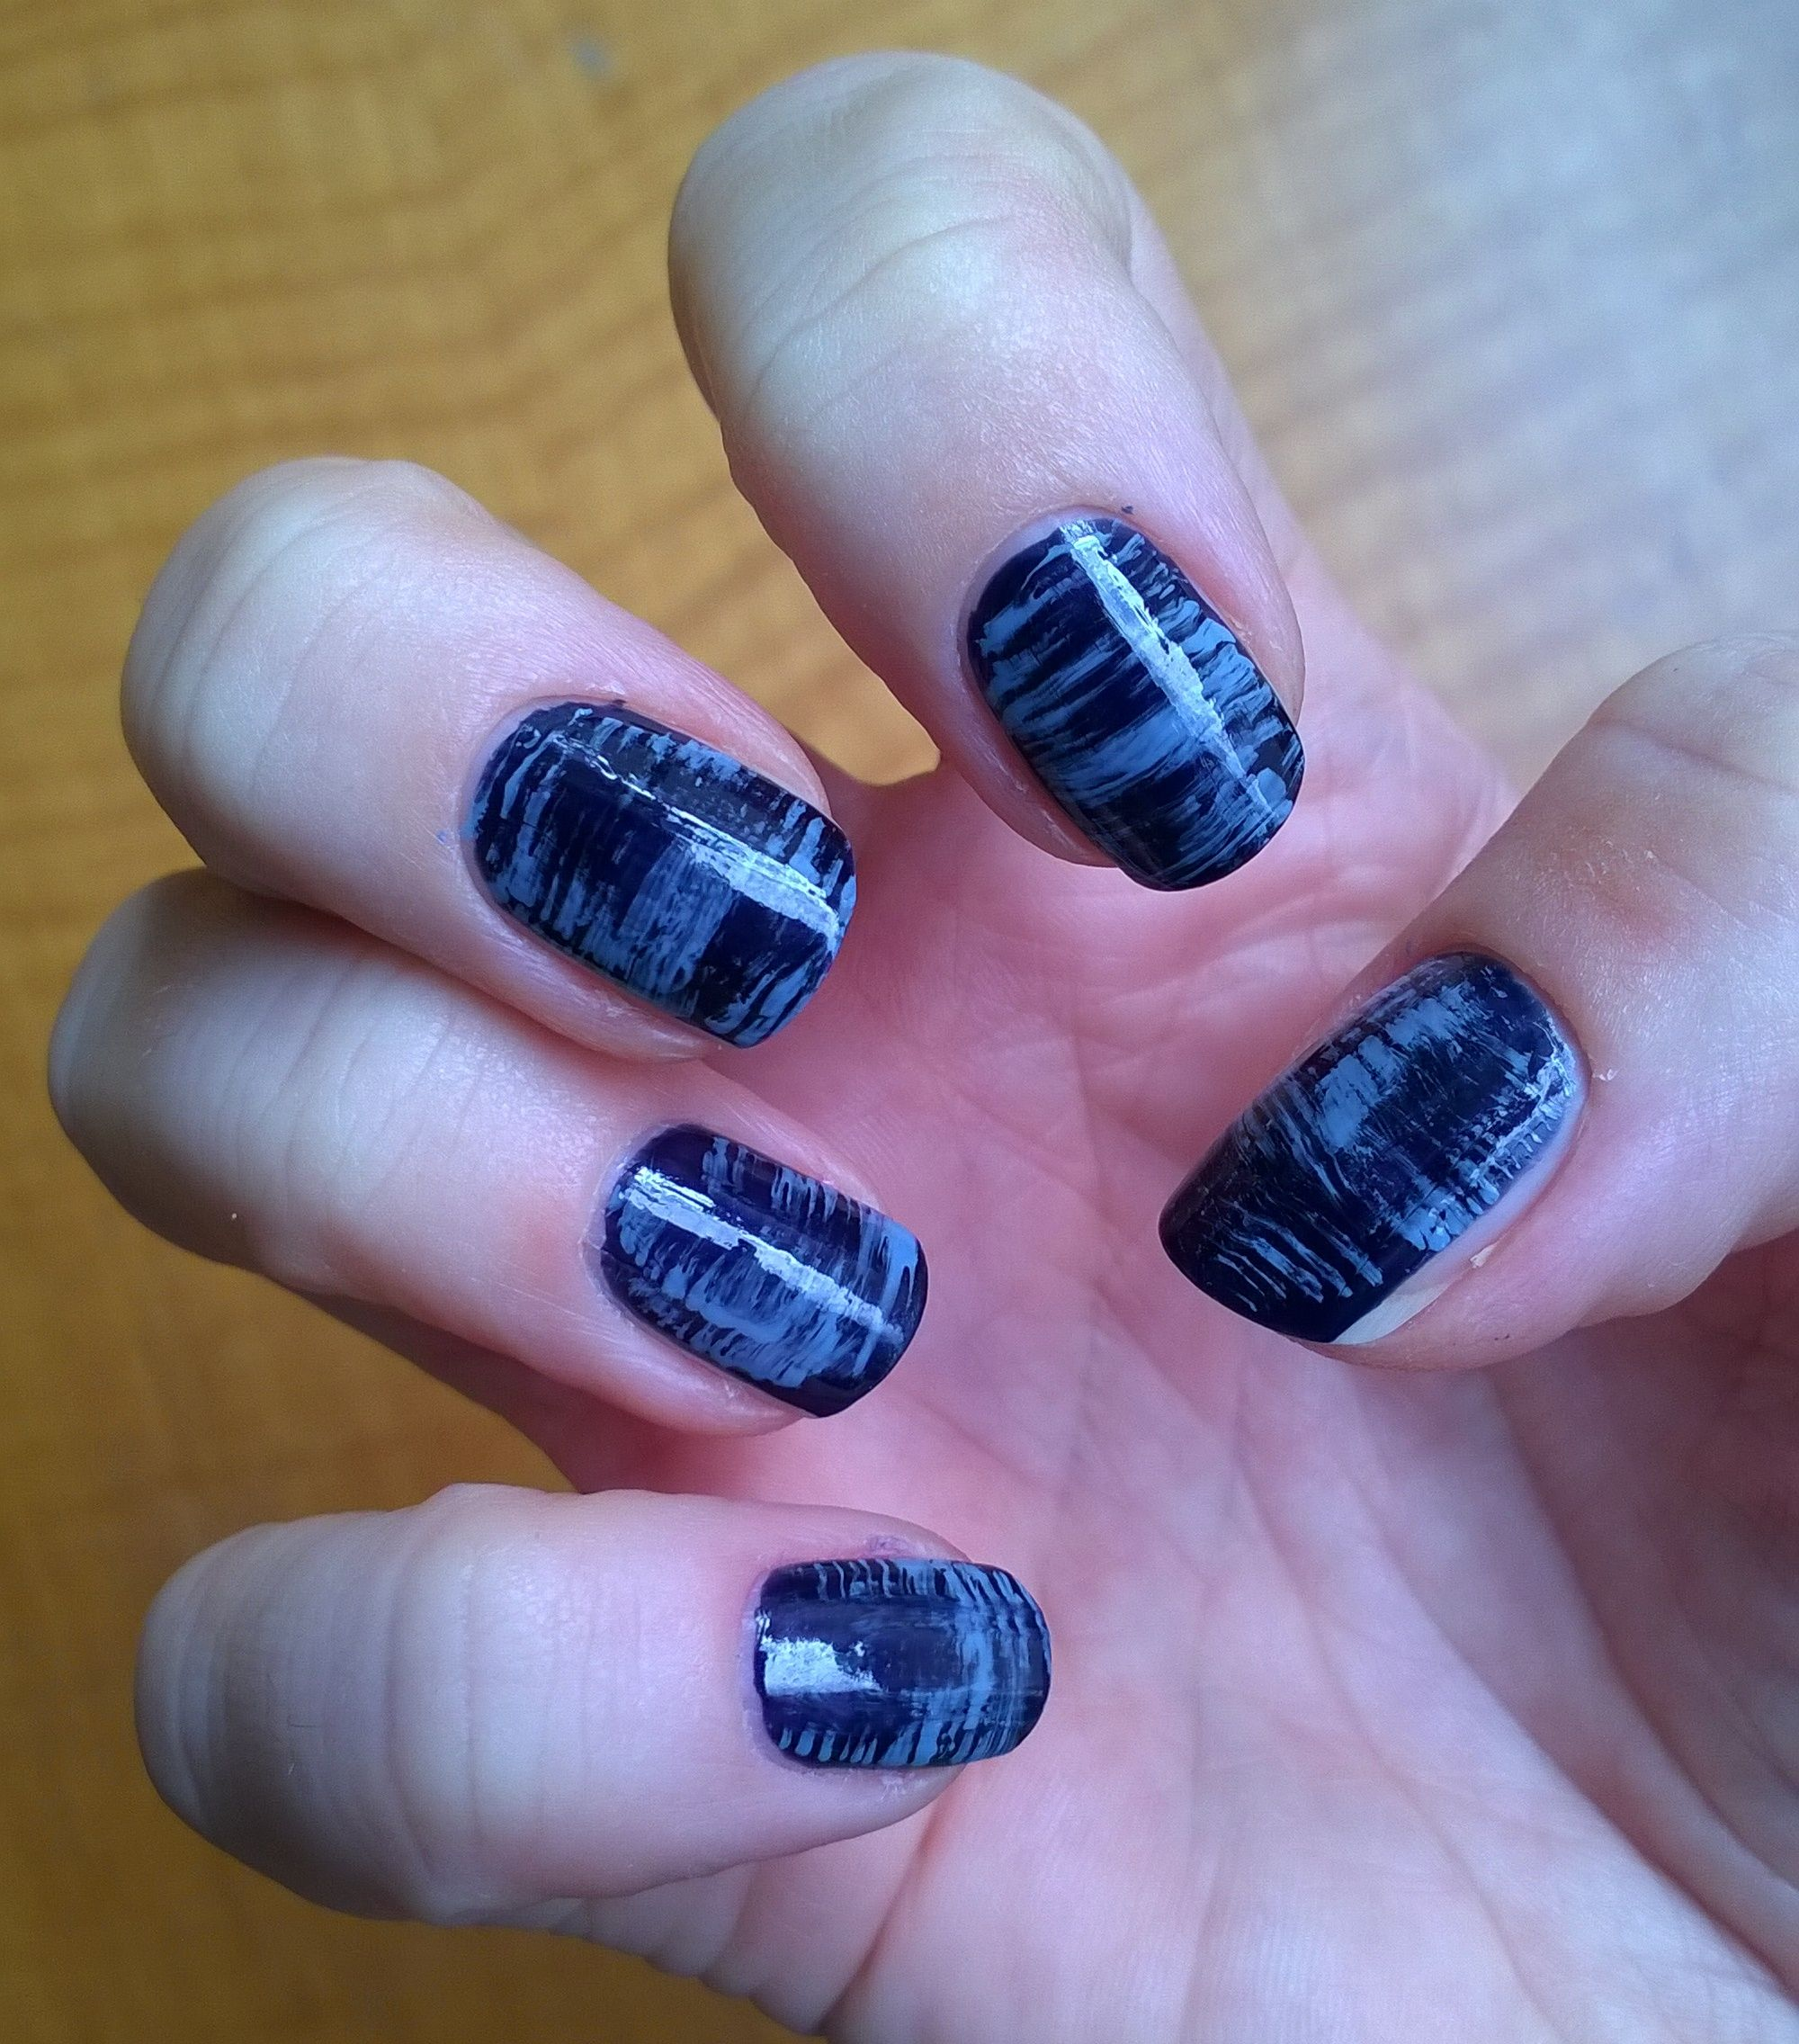 Blue stripped fan brush nails https://www.youtube.com/watch?v ...